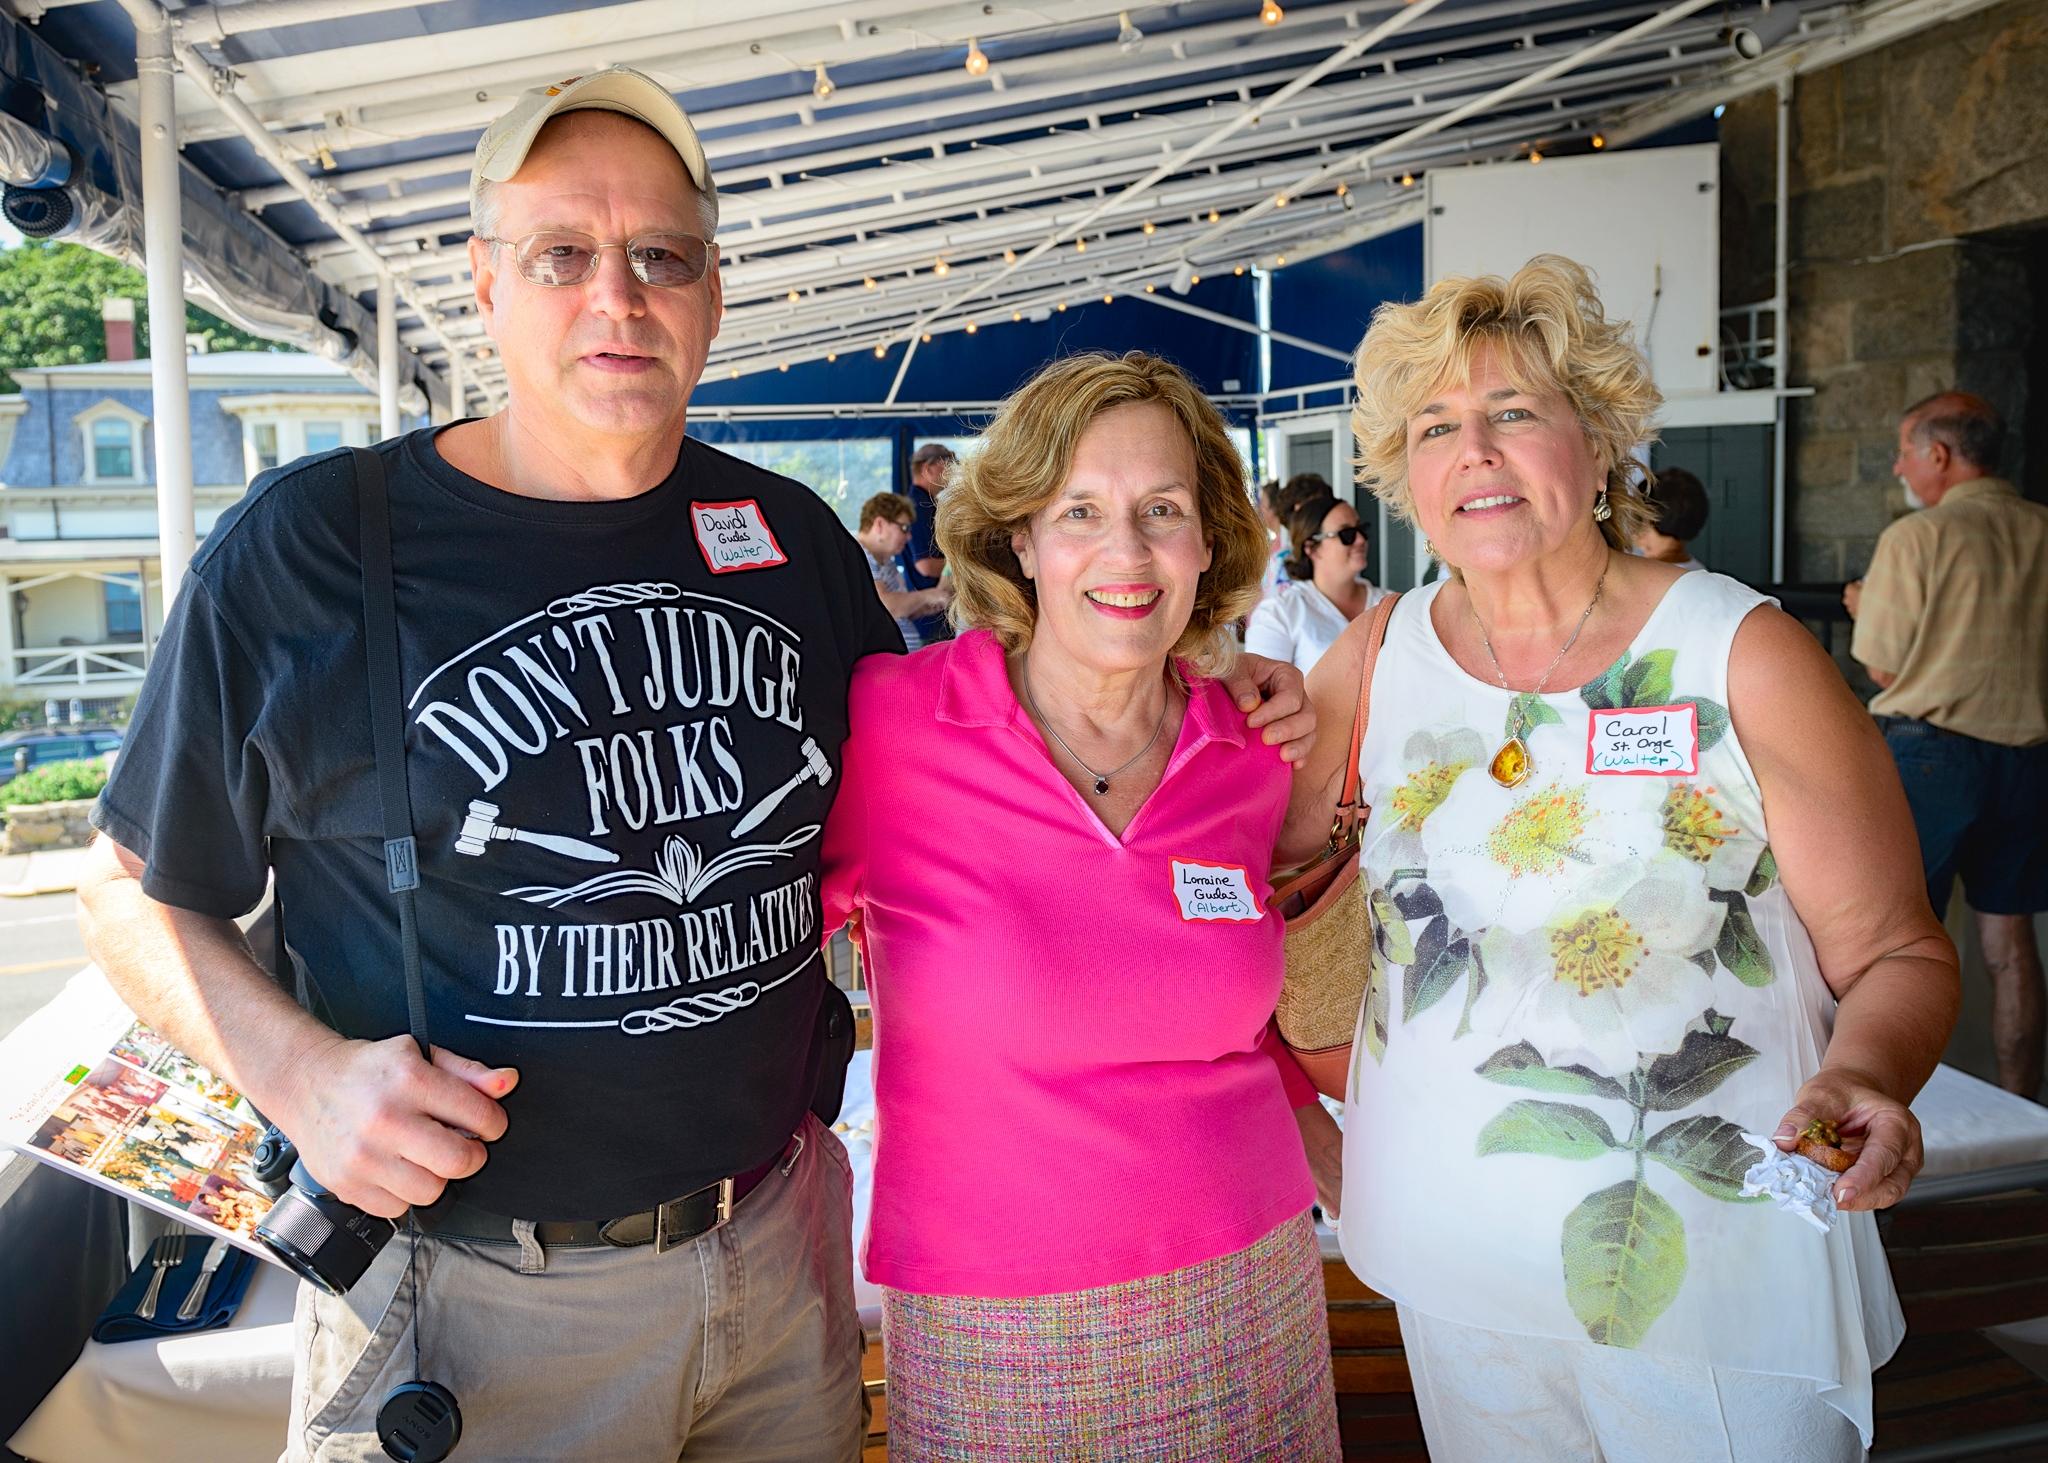 David, Lorraine, & Carol